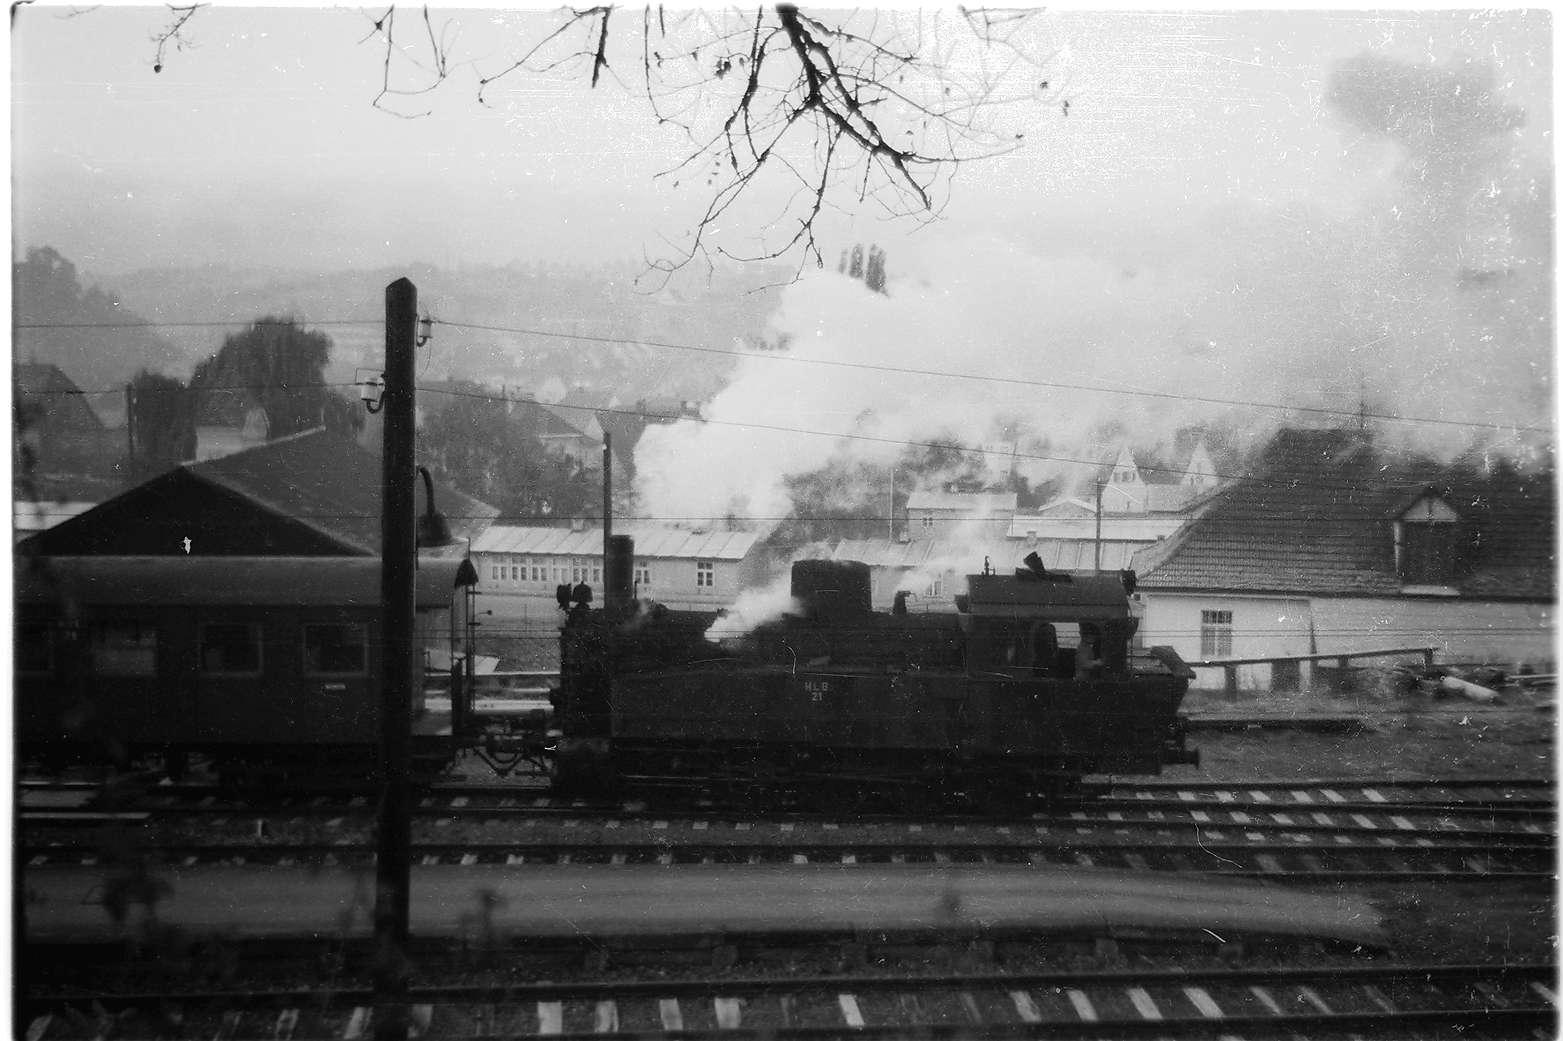 Hechingen, Zug 300, Lok 21, Blick vom Bundesbahnhof, Bild 1